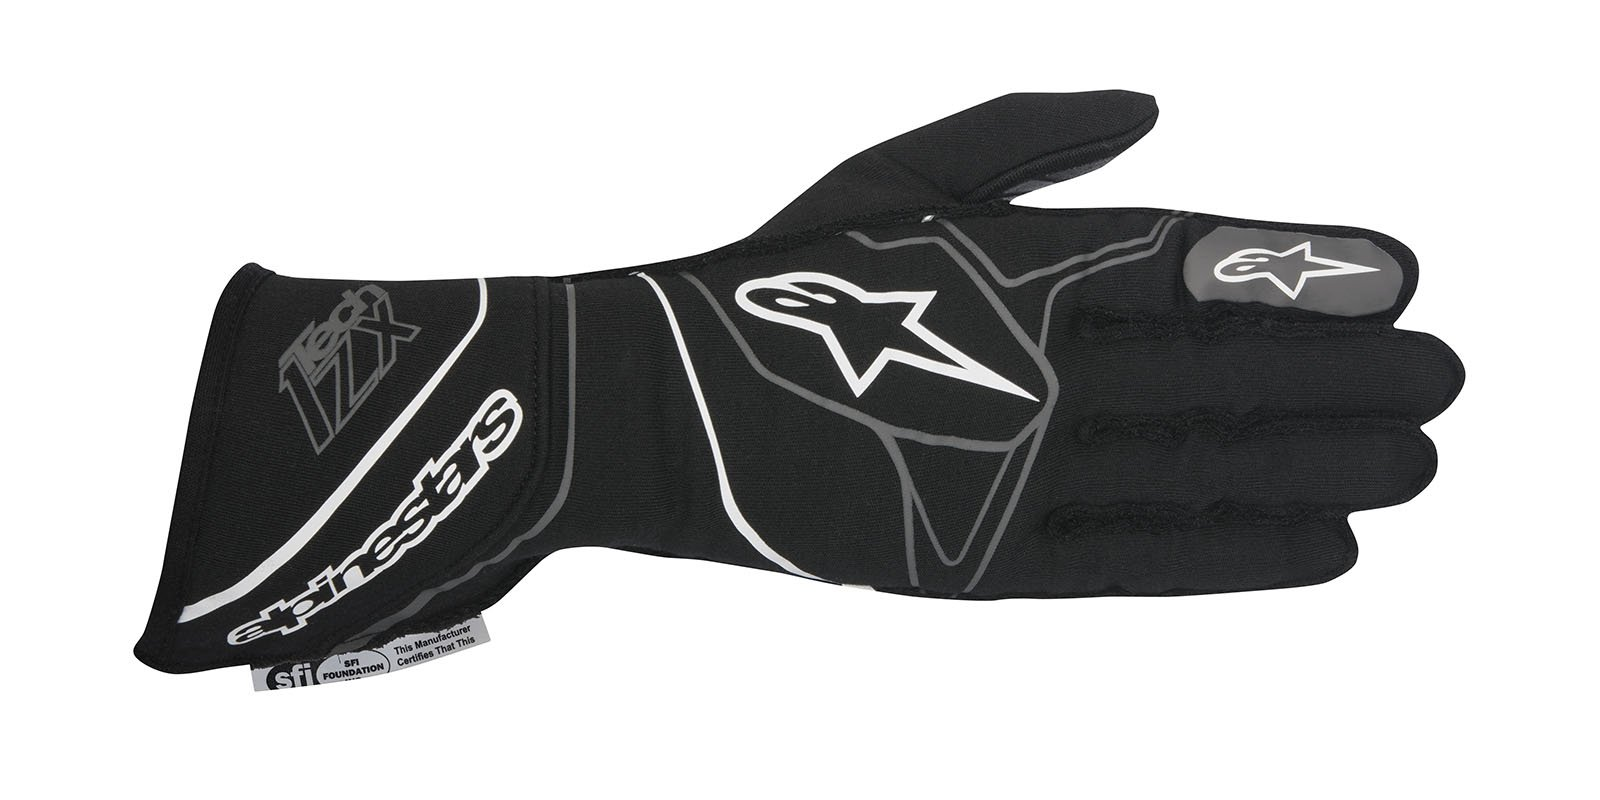 Alpinestars 2017 Tech 1-ZX Glove - Size XX-Large - Black/White - SFI 3.3 LEVEL 5/FIA 8856-2000 (3550317-12B-2XL)